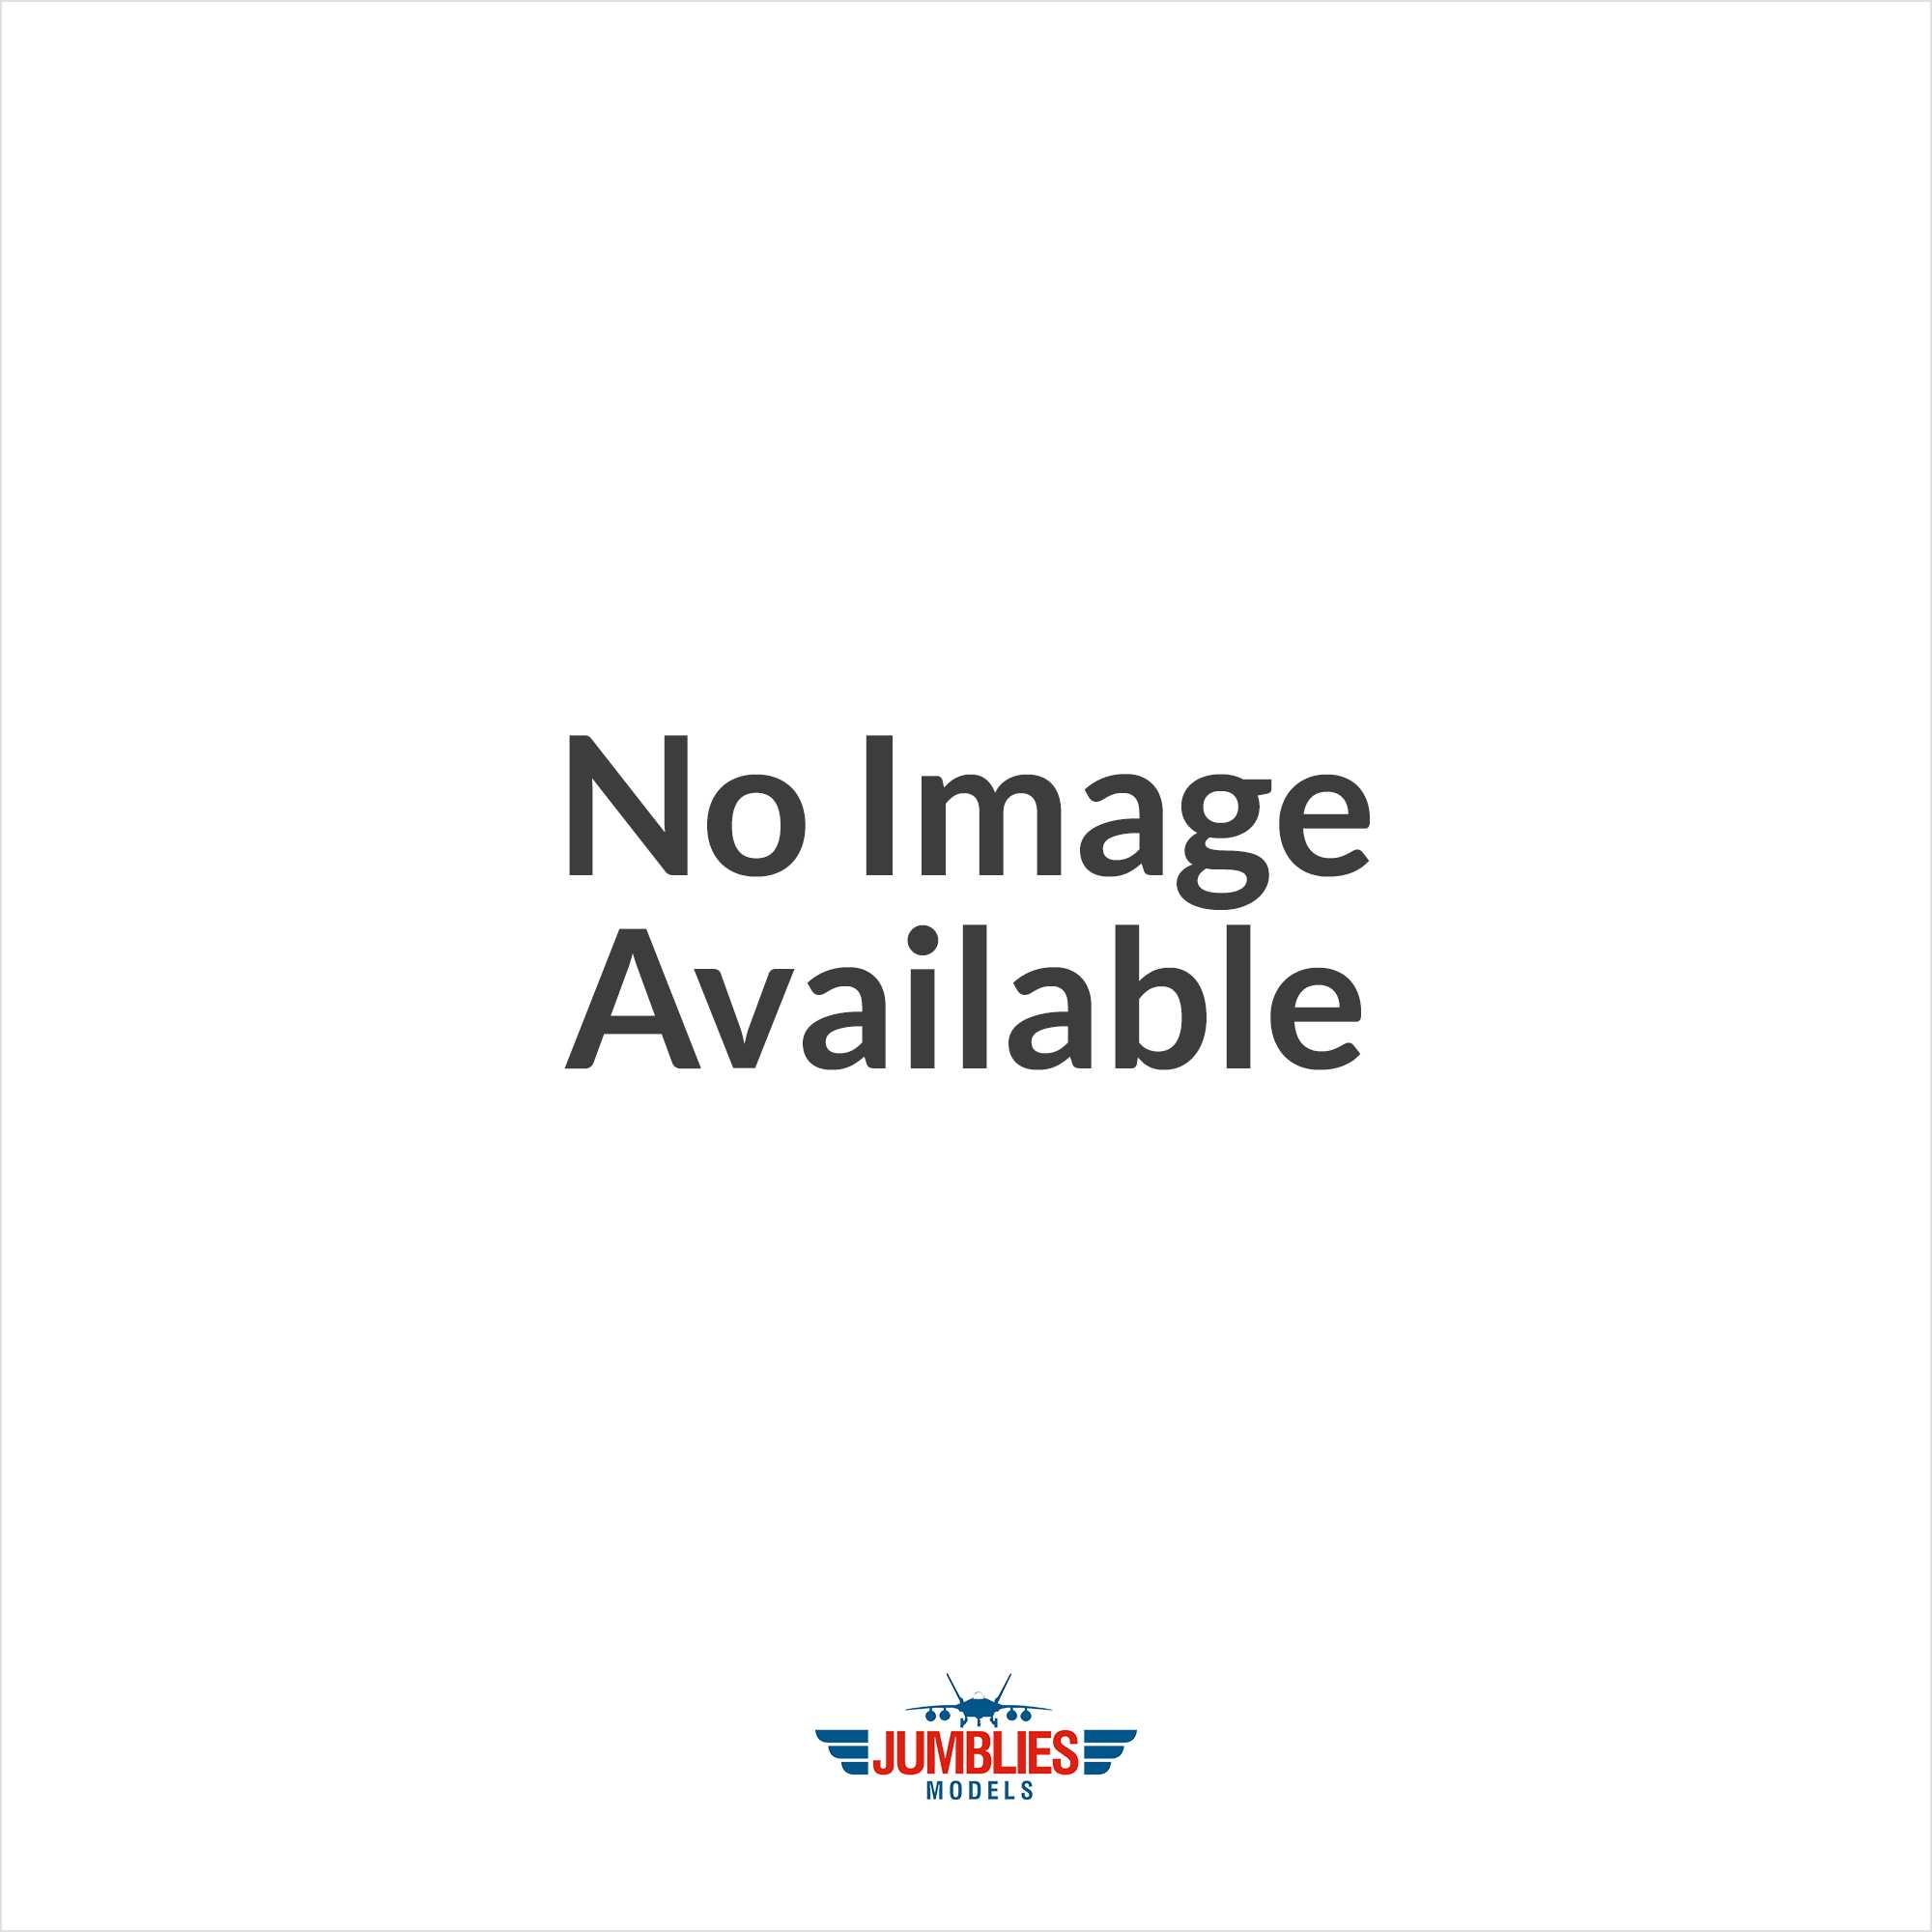 Century Wings 1:72 F-14B Tomcat US Navy VF-103 Jolly Rogers AJ101